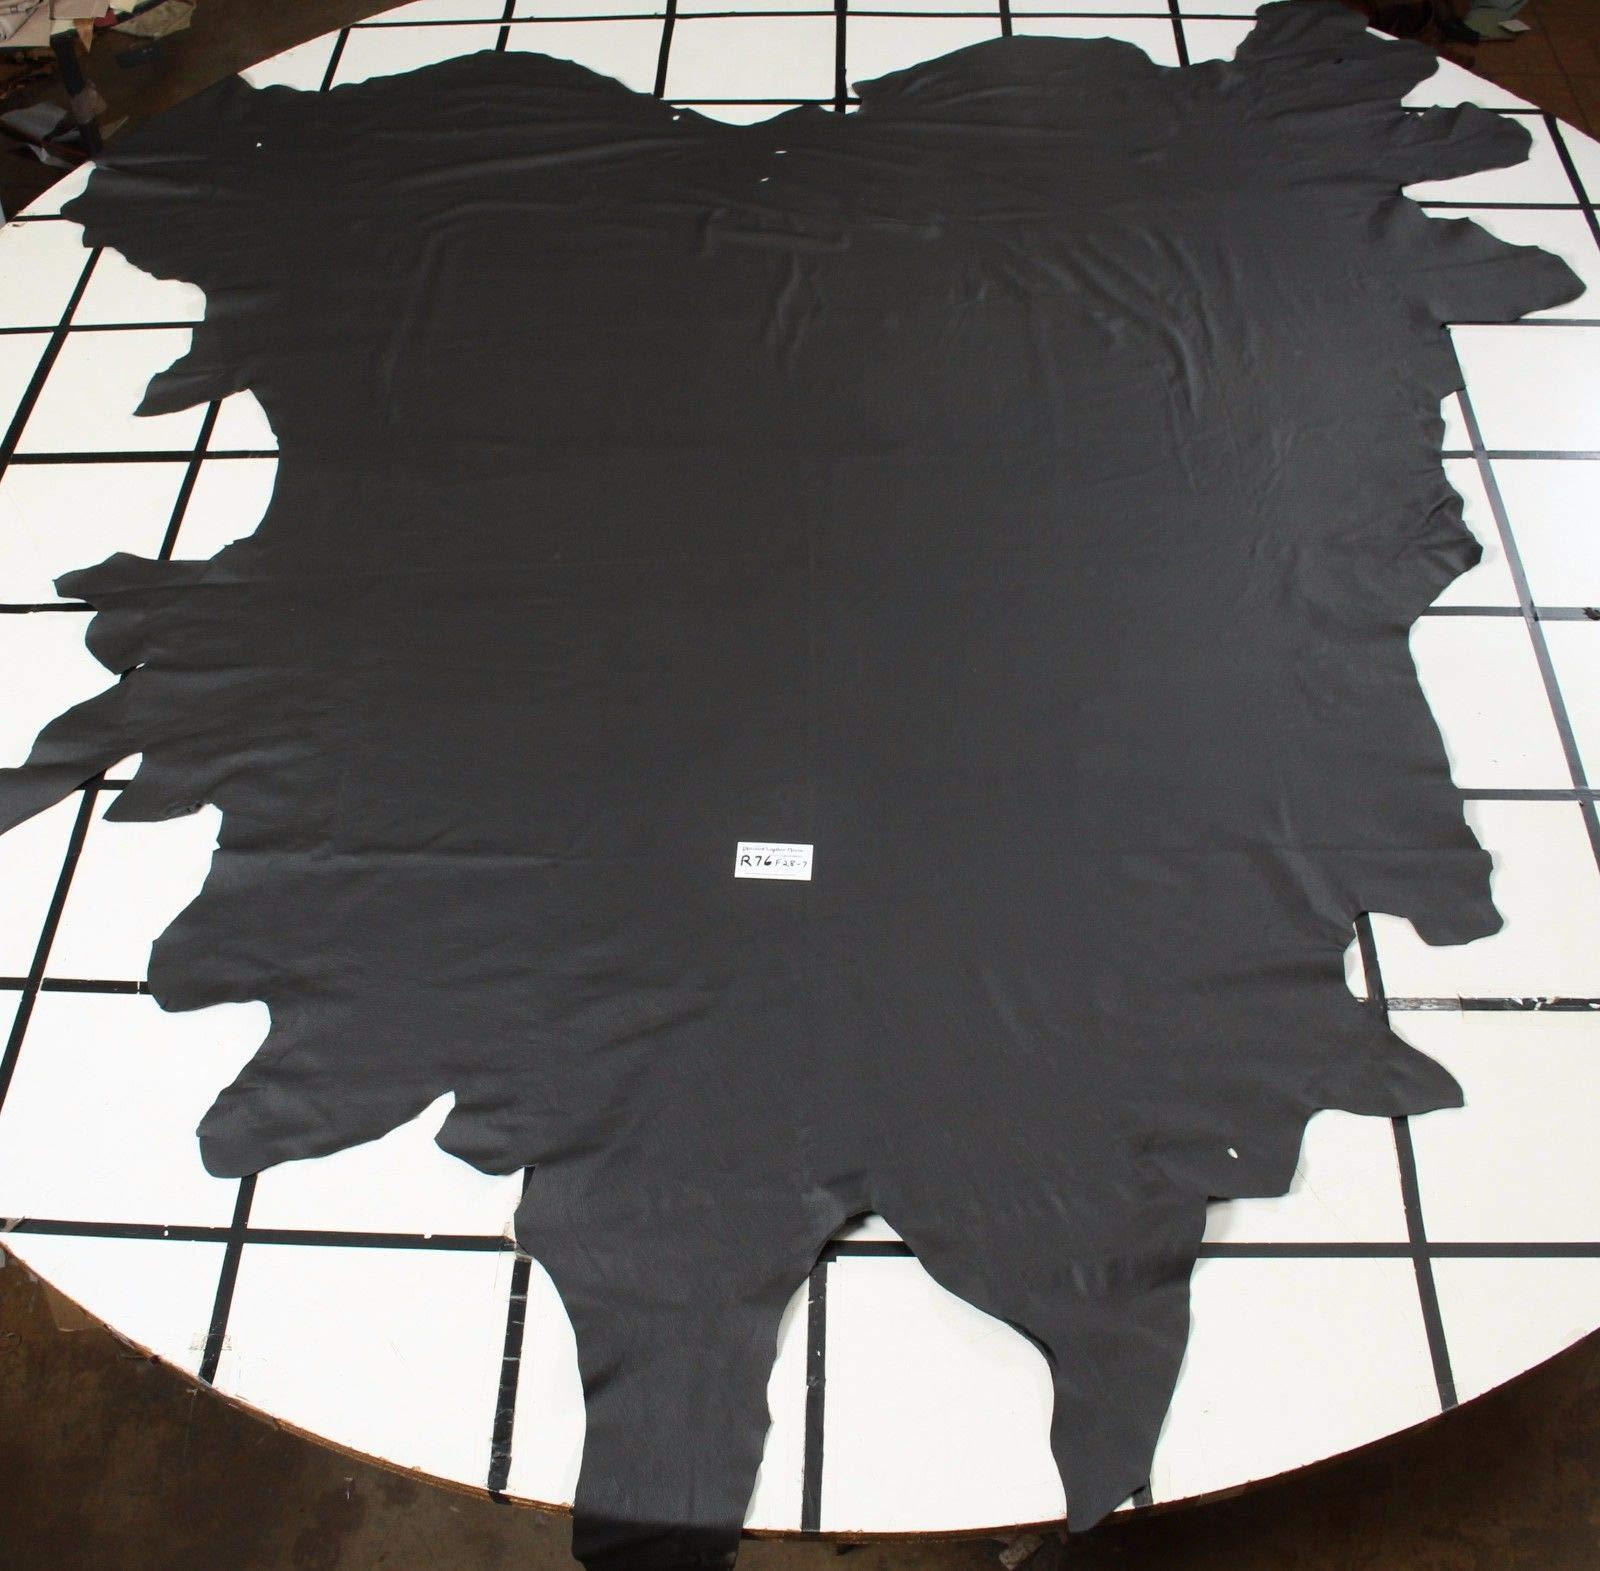 Stunning Black Graphite Automotive Leather Hides AVG 44 sqft $99 per Hide!!!!